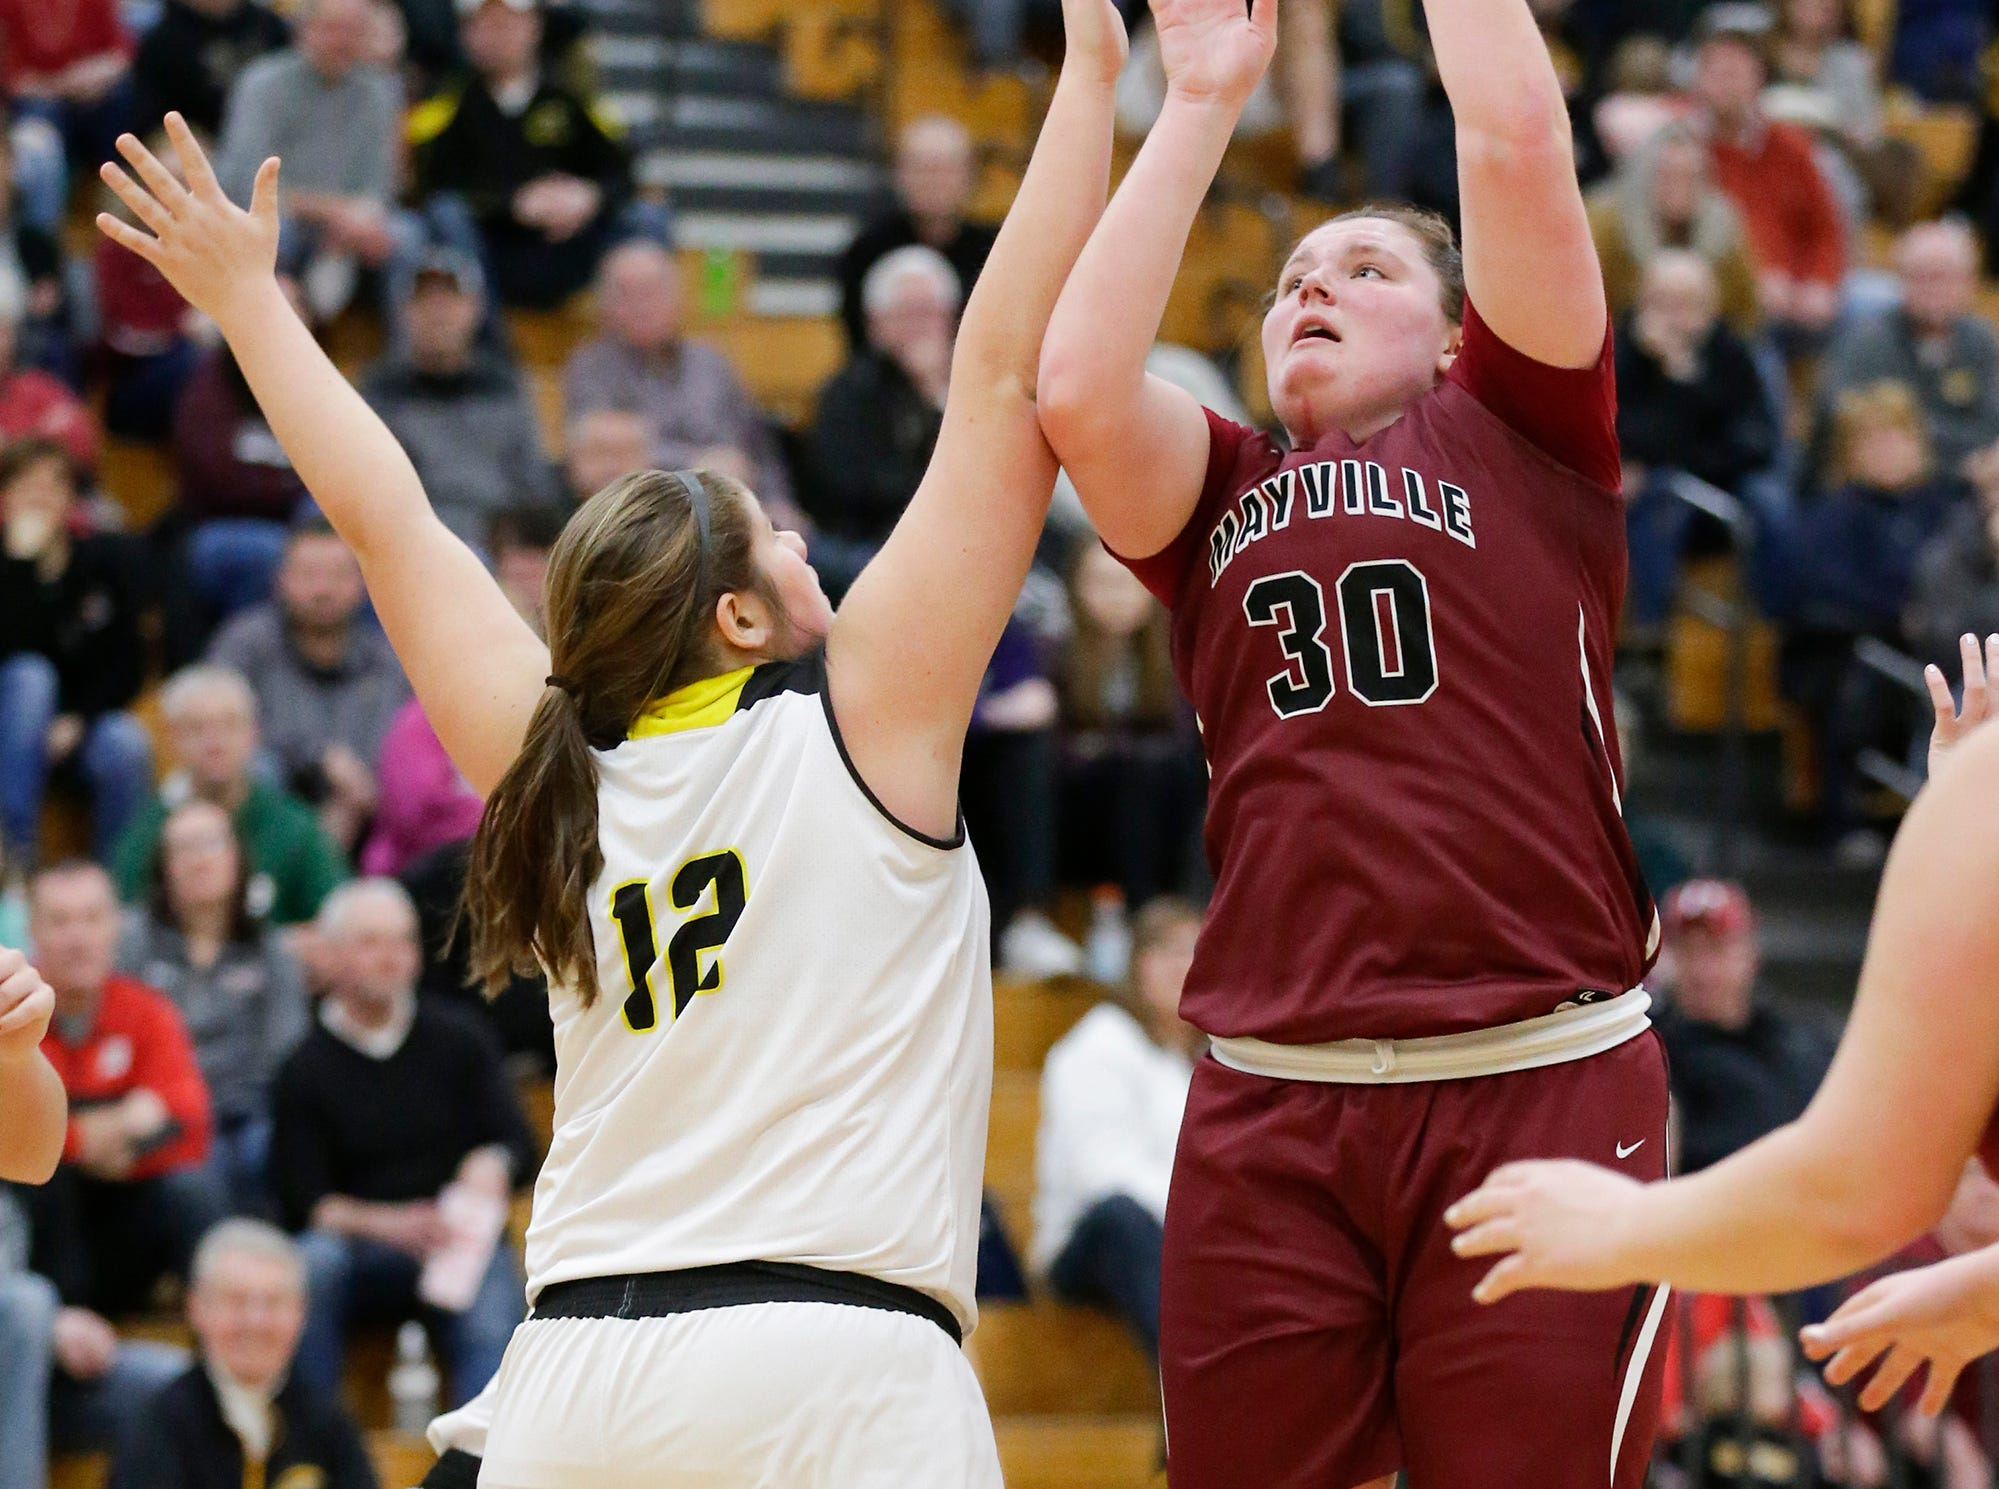 Mayville High School girls basketball's Sydney Schultz (30) shoots a basket over Waupun High School's Kelli Bonack (12) Saturday, February 23, 2019 during their WIAA Division 4 sectional quarterfinal game in Waupun. Waupun won the game 62-45. Doug Raflik/USA TODAY NETWORK-Wisconsin